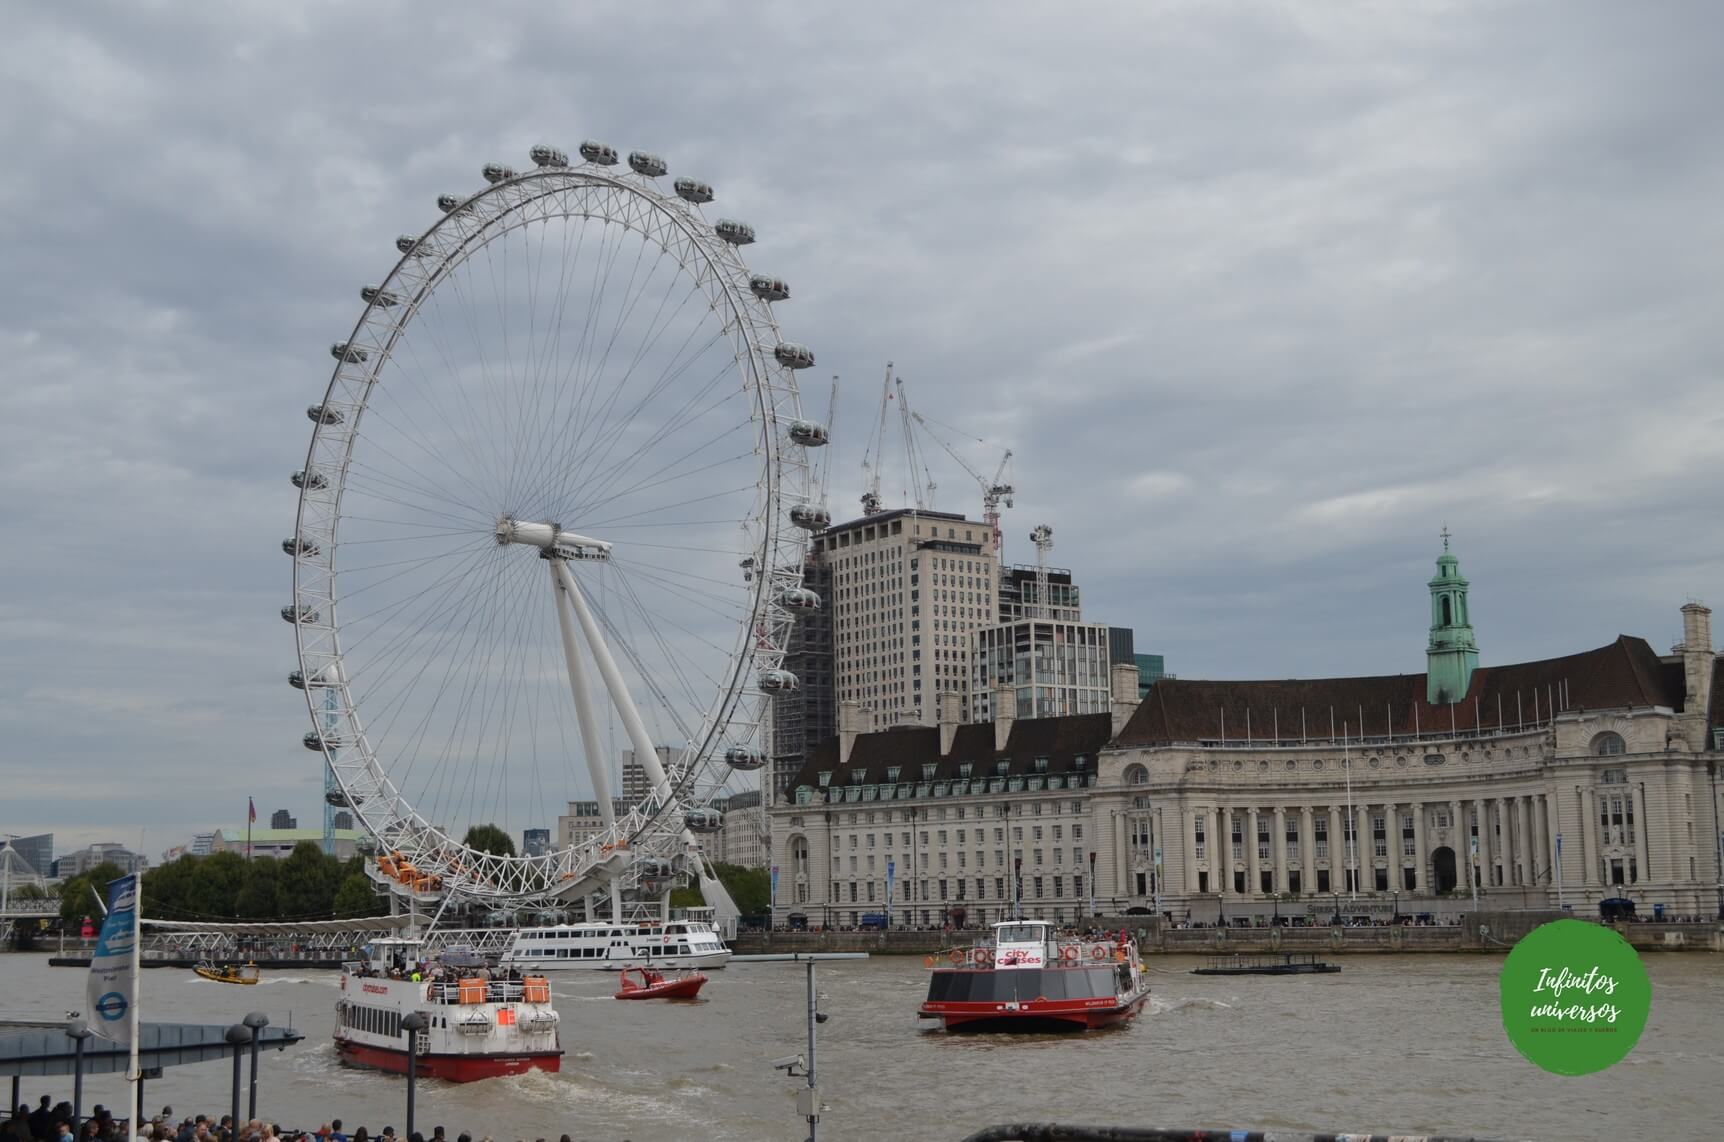 londres - Que ver en Londres